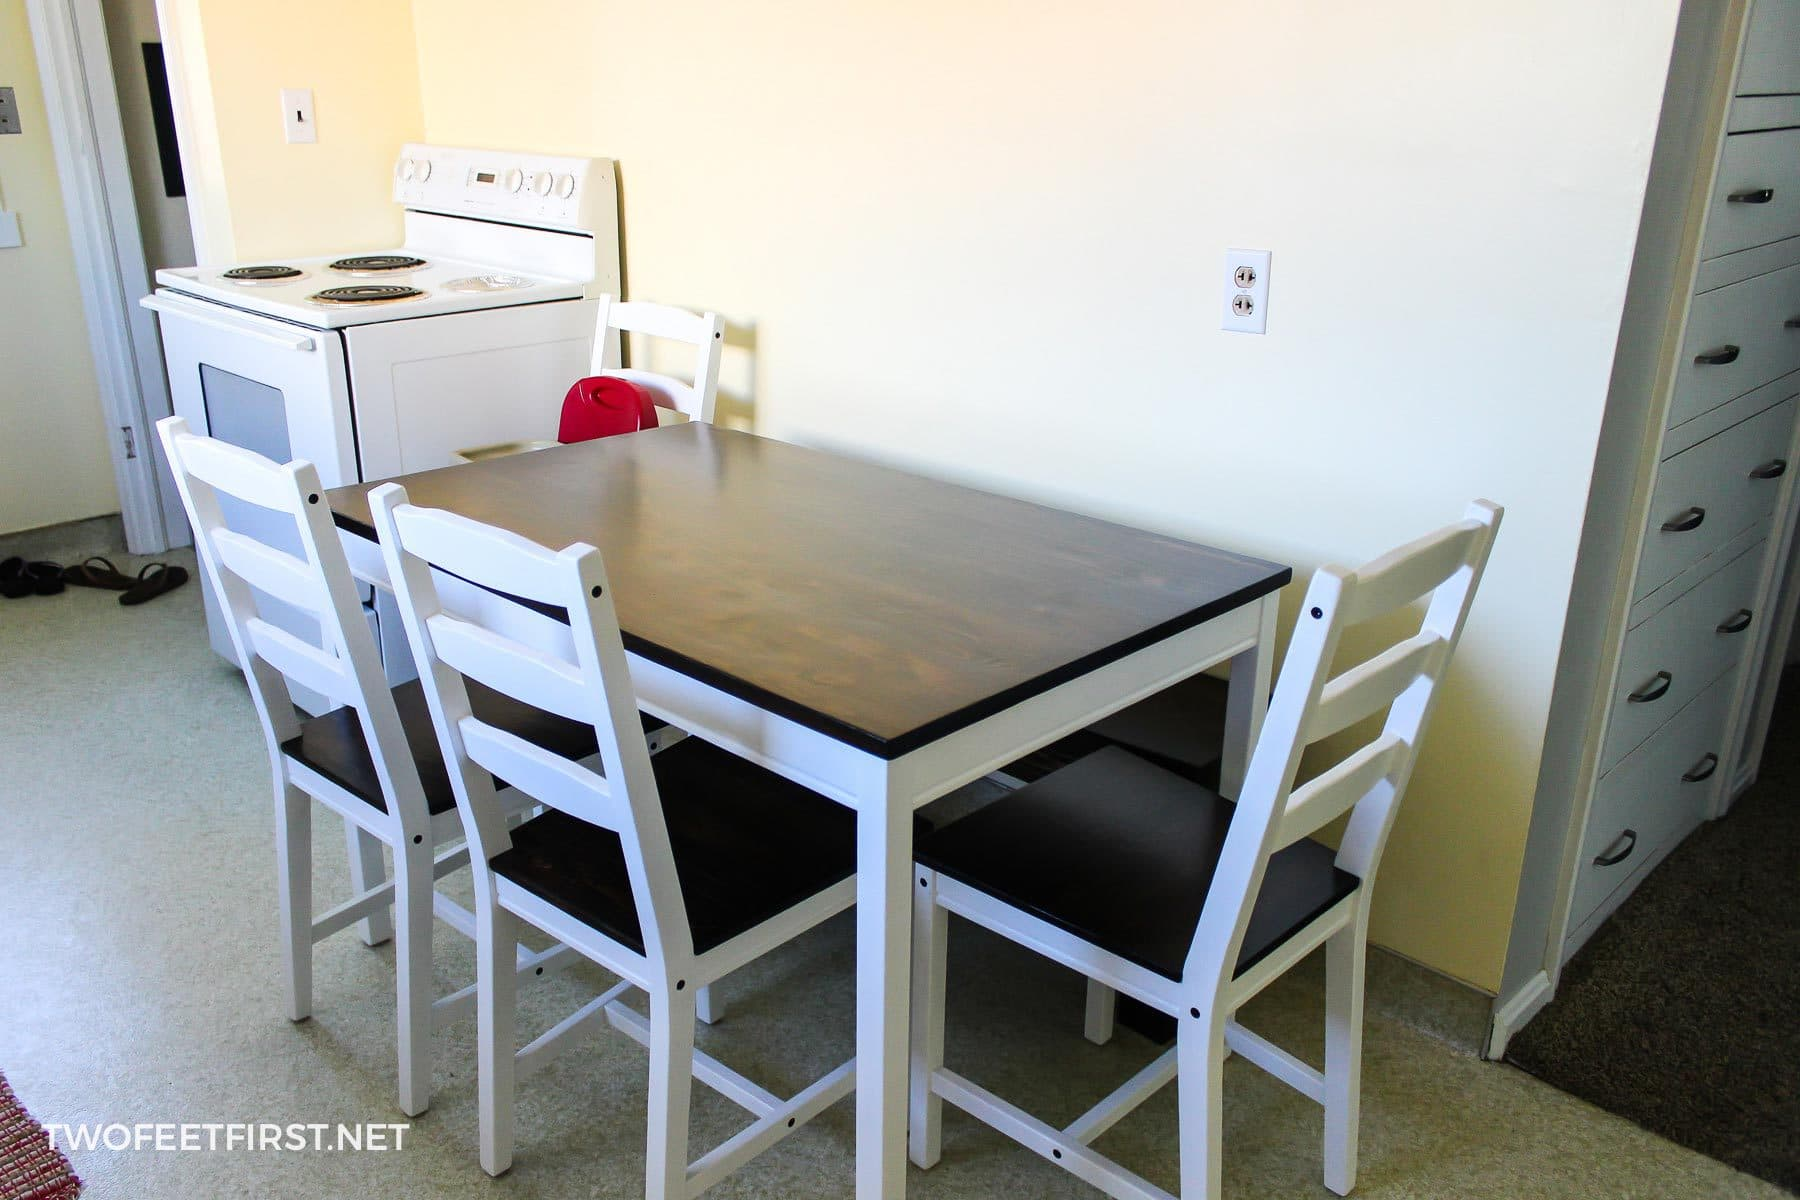 Ikea hack farmhouse table updated ikea table to farmhouse watchthetrailerfo